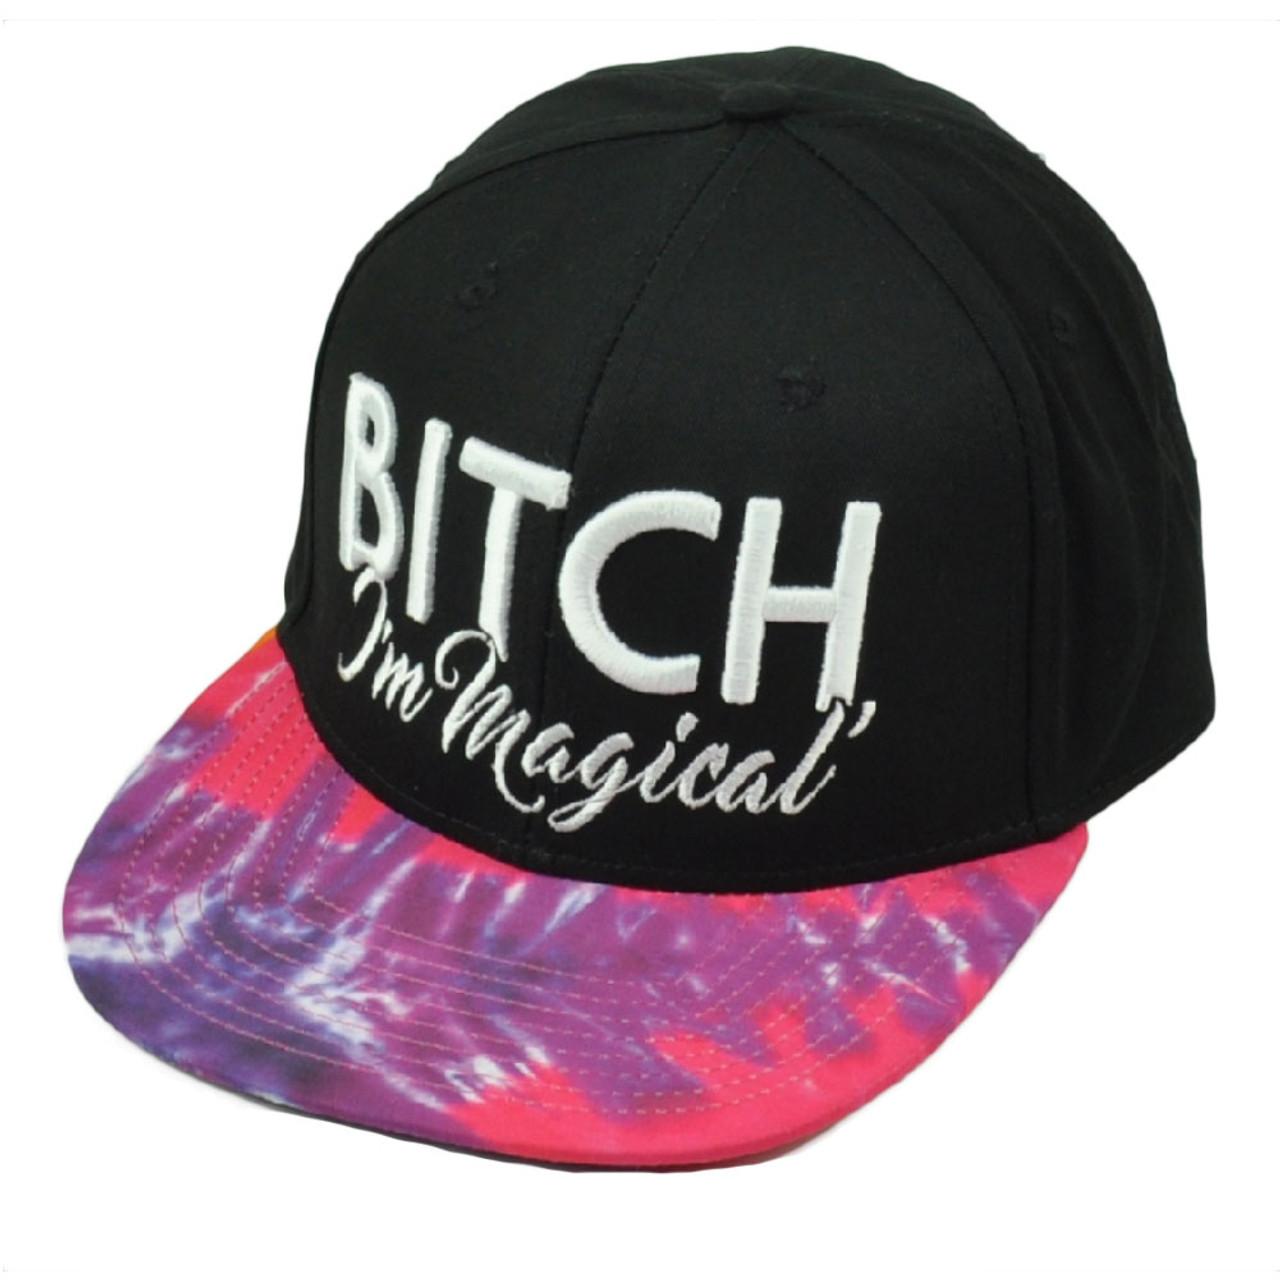 c5dc800b30c3f B   h Im Magical Tie Dye Flat Bill Snapback Hat Cap Black Pink Funny  Headwear - Cap Store Online.com